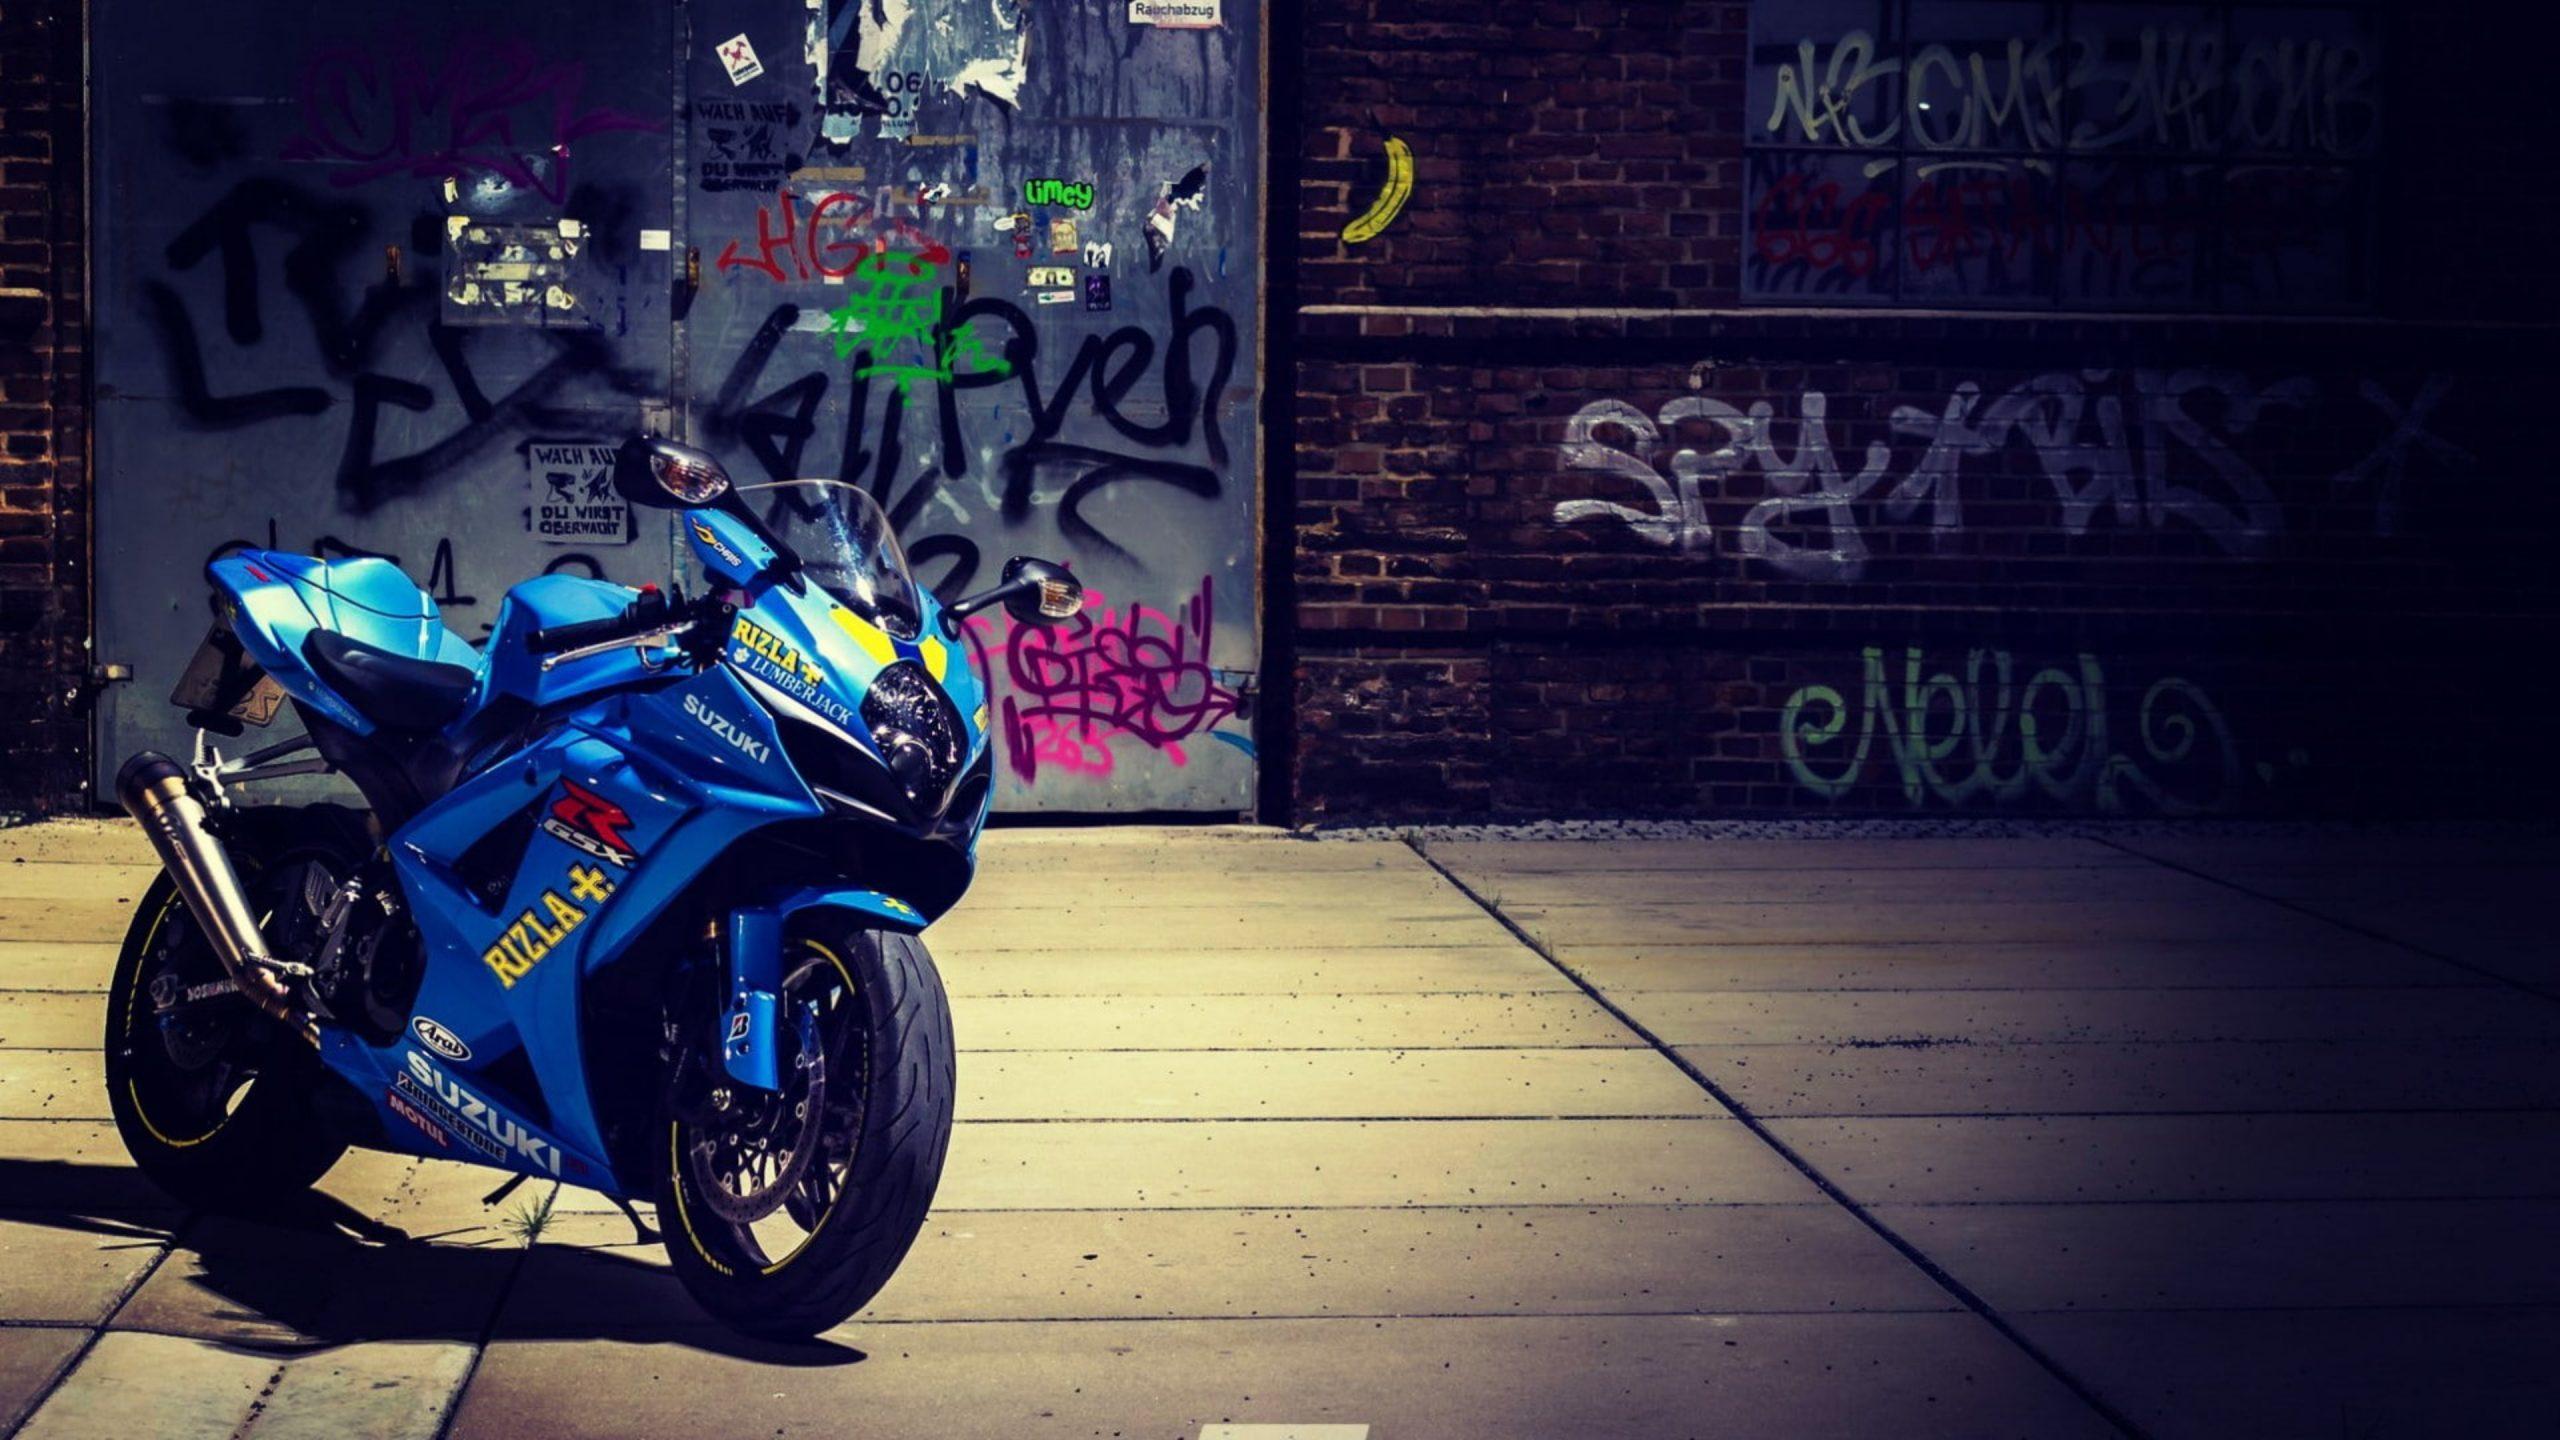 Suzuki Motorcycle [4K] Wallpapers BadAssHelmetStore 2560x1440